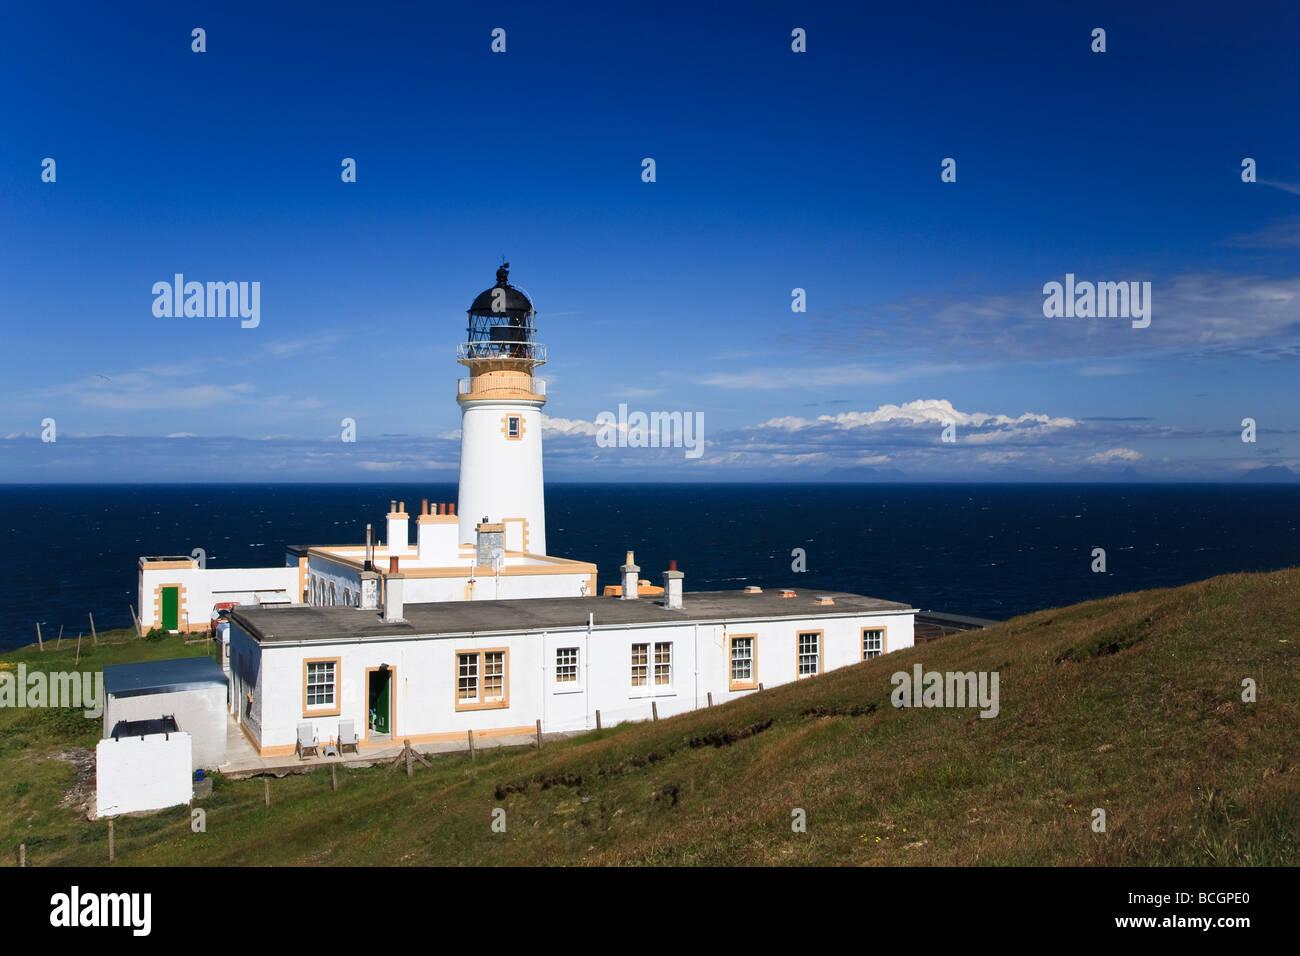 Tiumpan Head lighthouse Isle of Lewis, Outer Hebrides, western isles, Scotland, UK 2009 - Stock Image